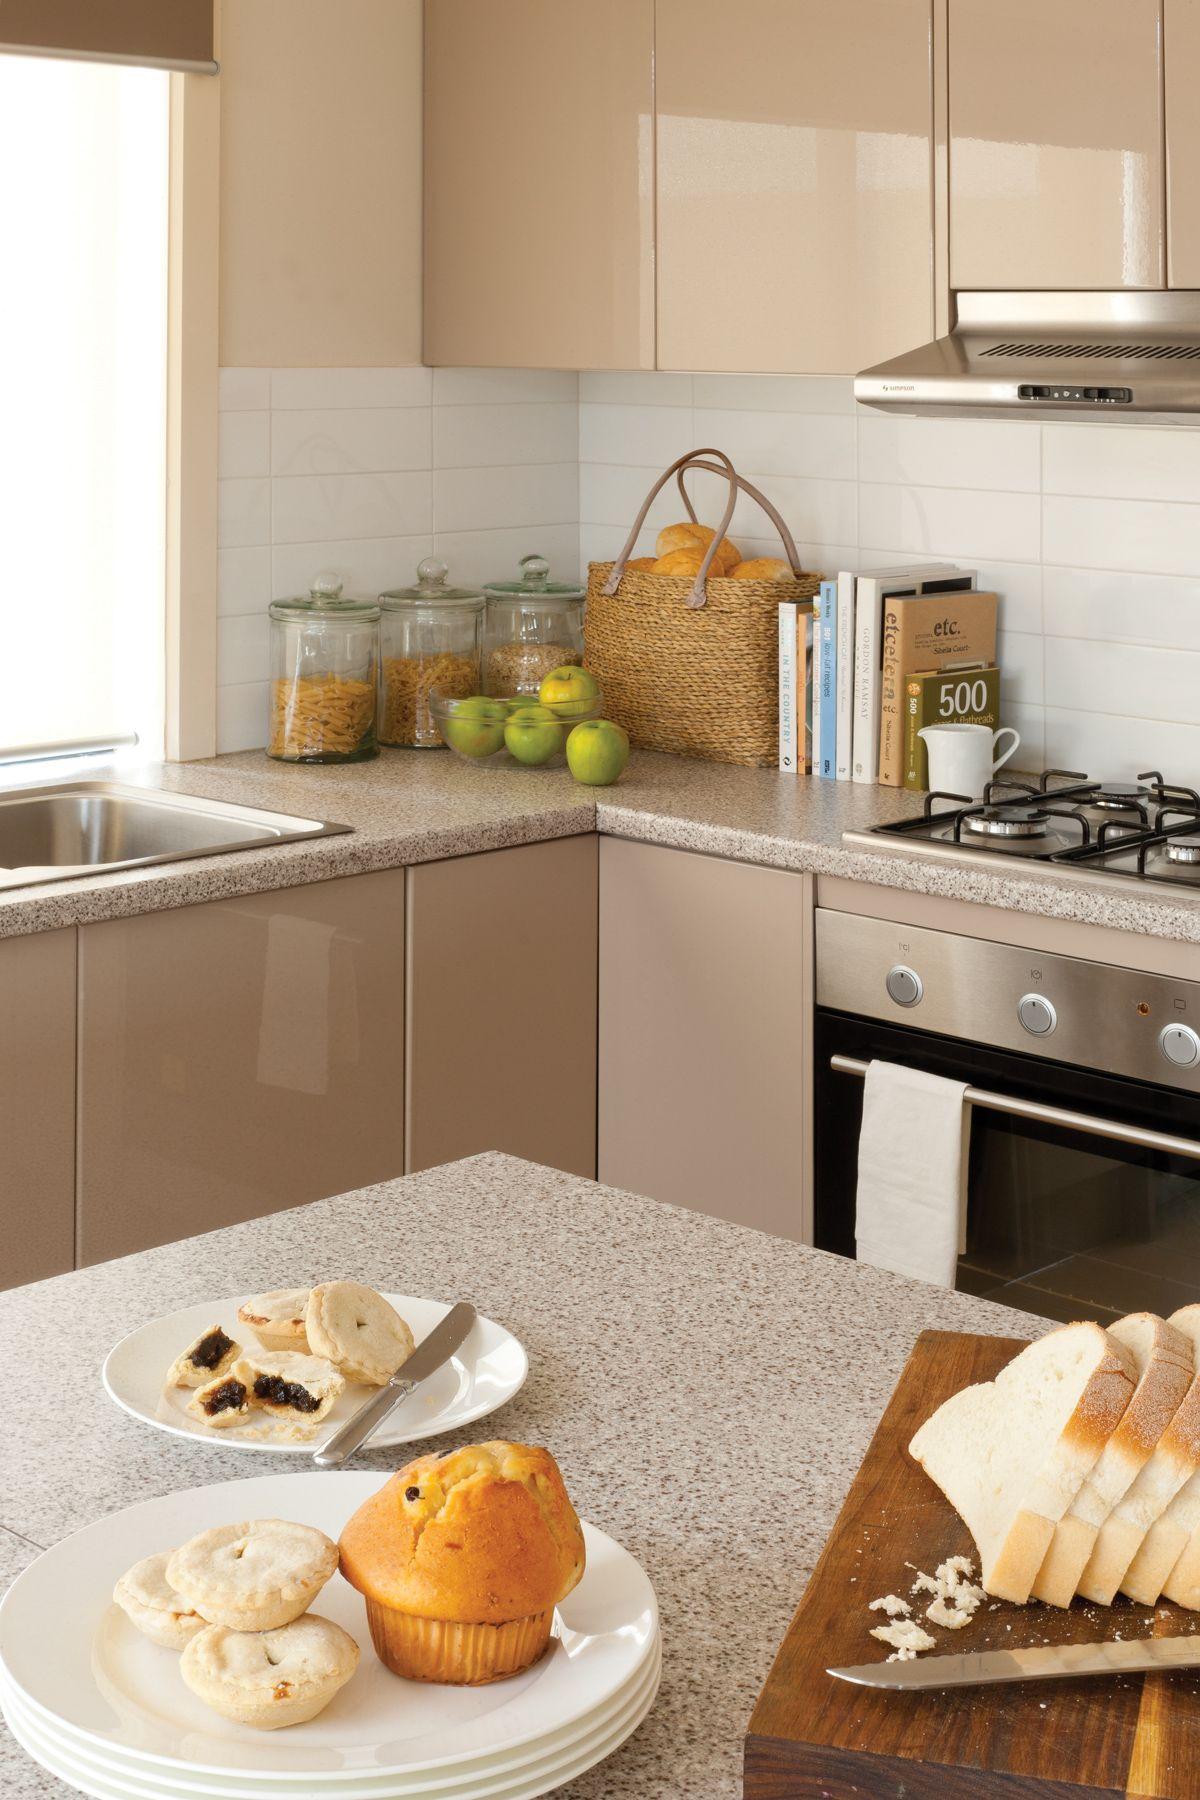 kitchen design ideas and inspiration gallery kaboodle kitchen kitchen renovation trends on kaboodle kitchen enoki id=99118